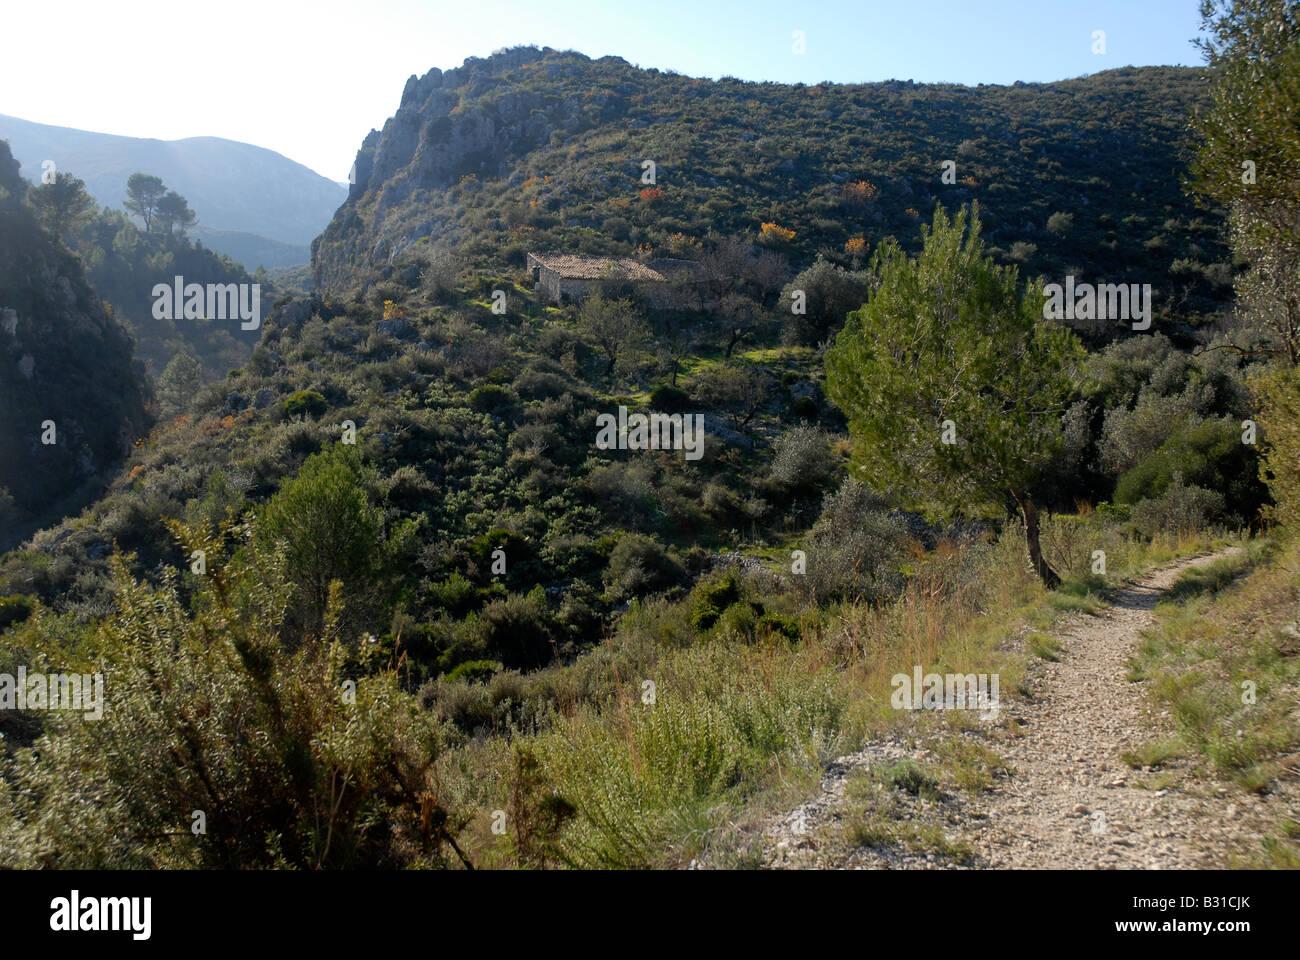 path leading down to Els Tolls, near Vall de Ebo, Marina Alta, Alicante Prov. Comunidad Valenciana, Spain - Stock Image